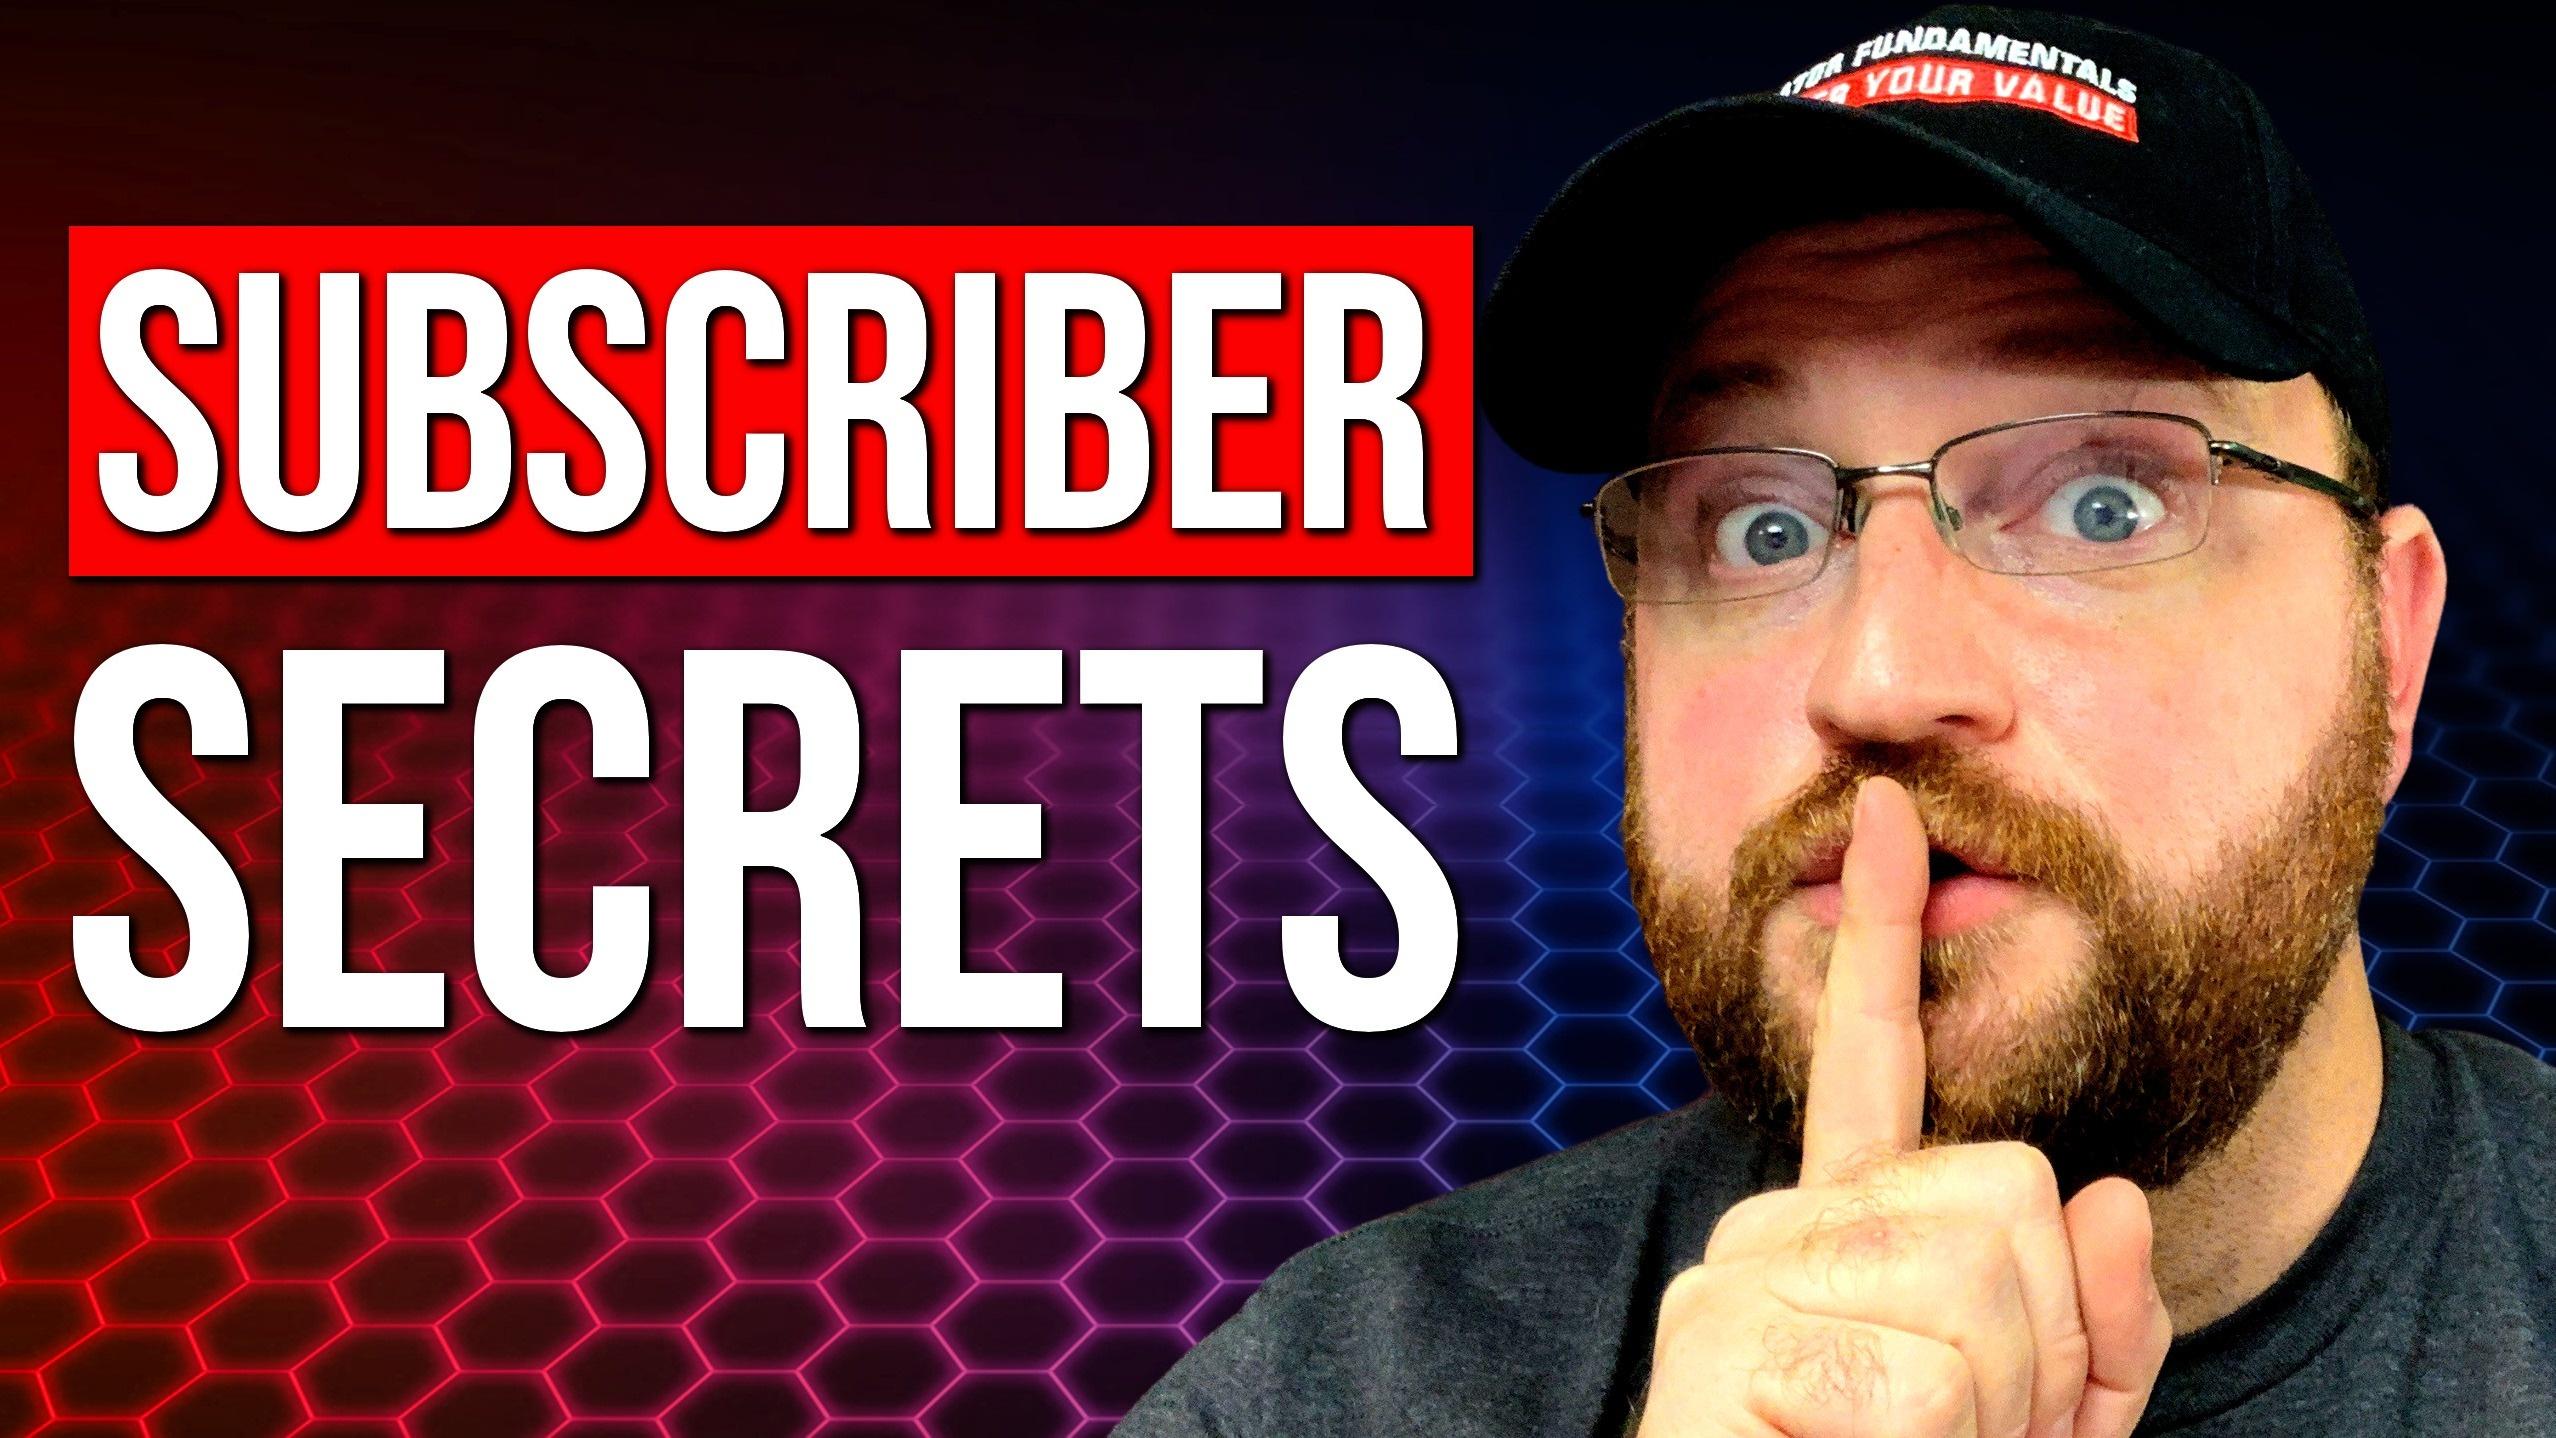 Subscriber Secrets